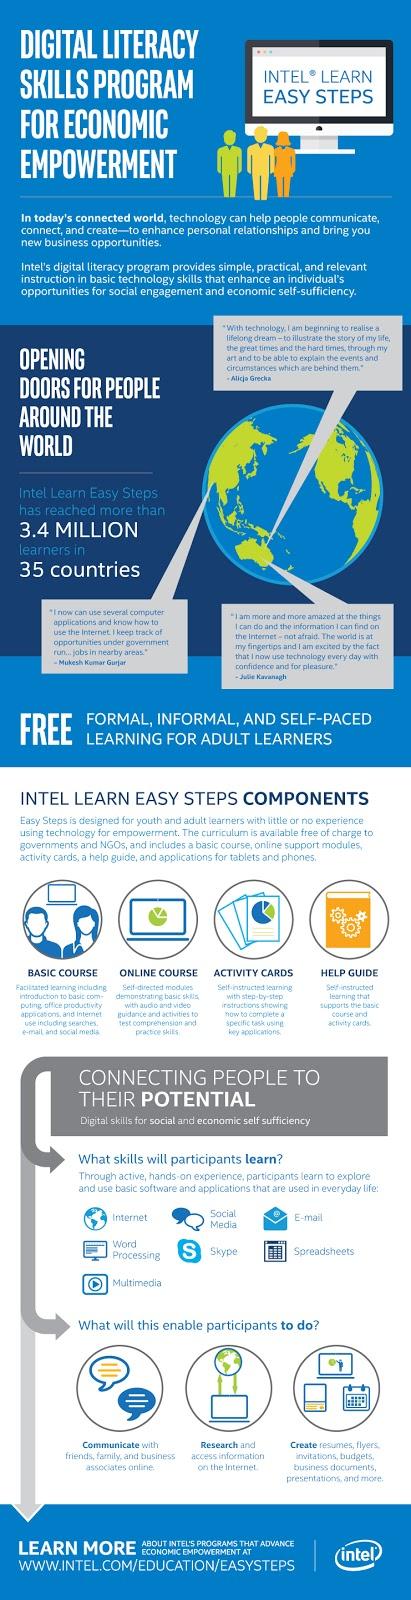 Intel ® Learn Easy Steps | Center for Education Innovations